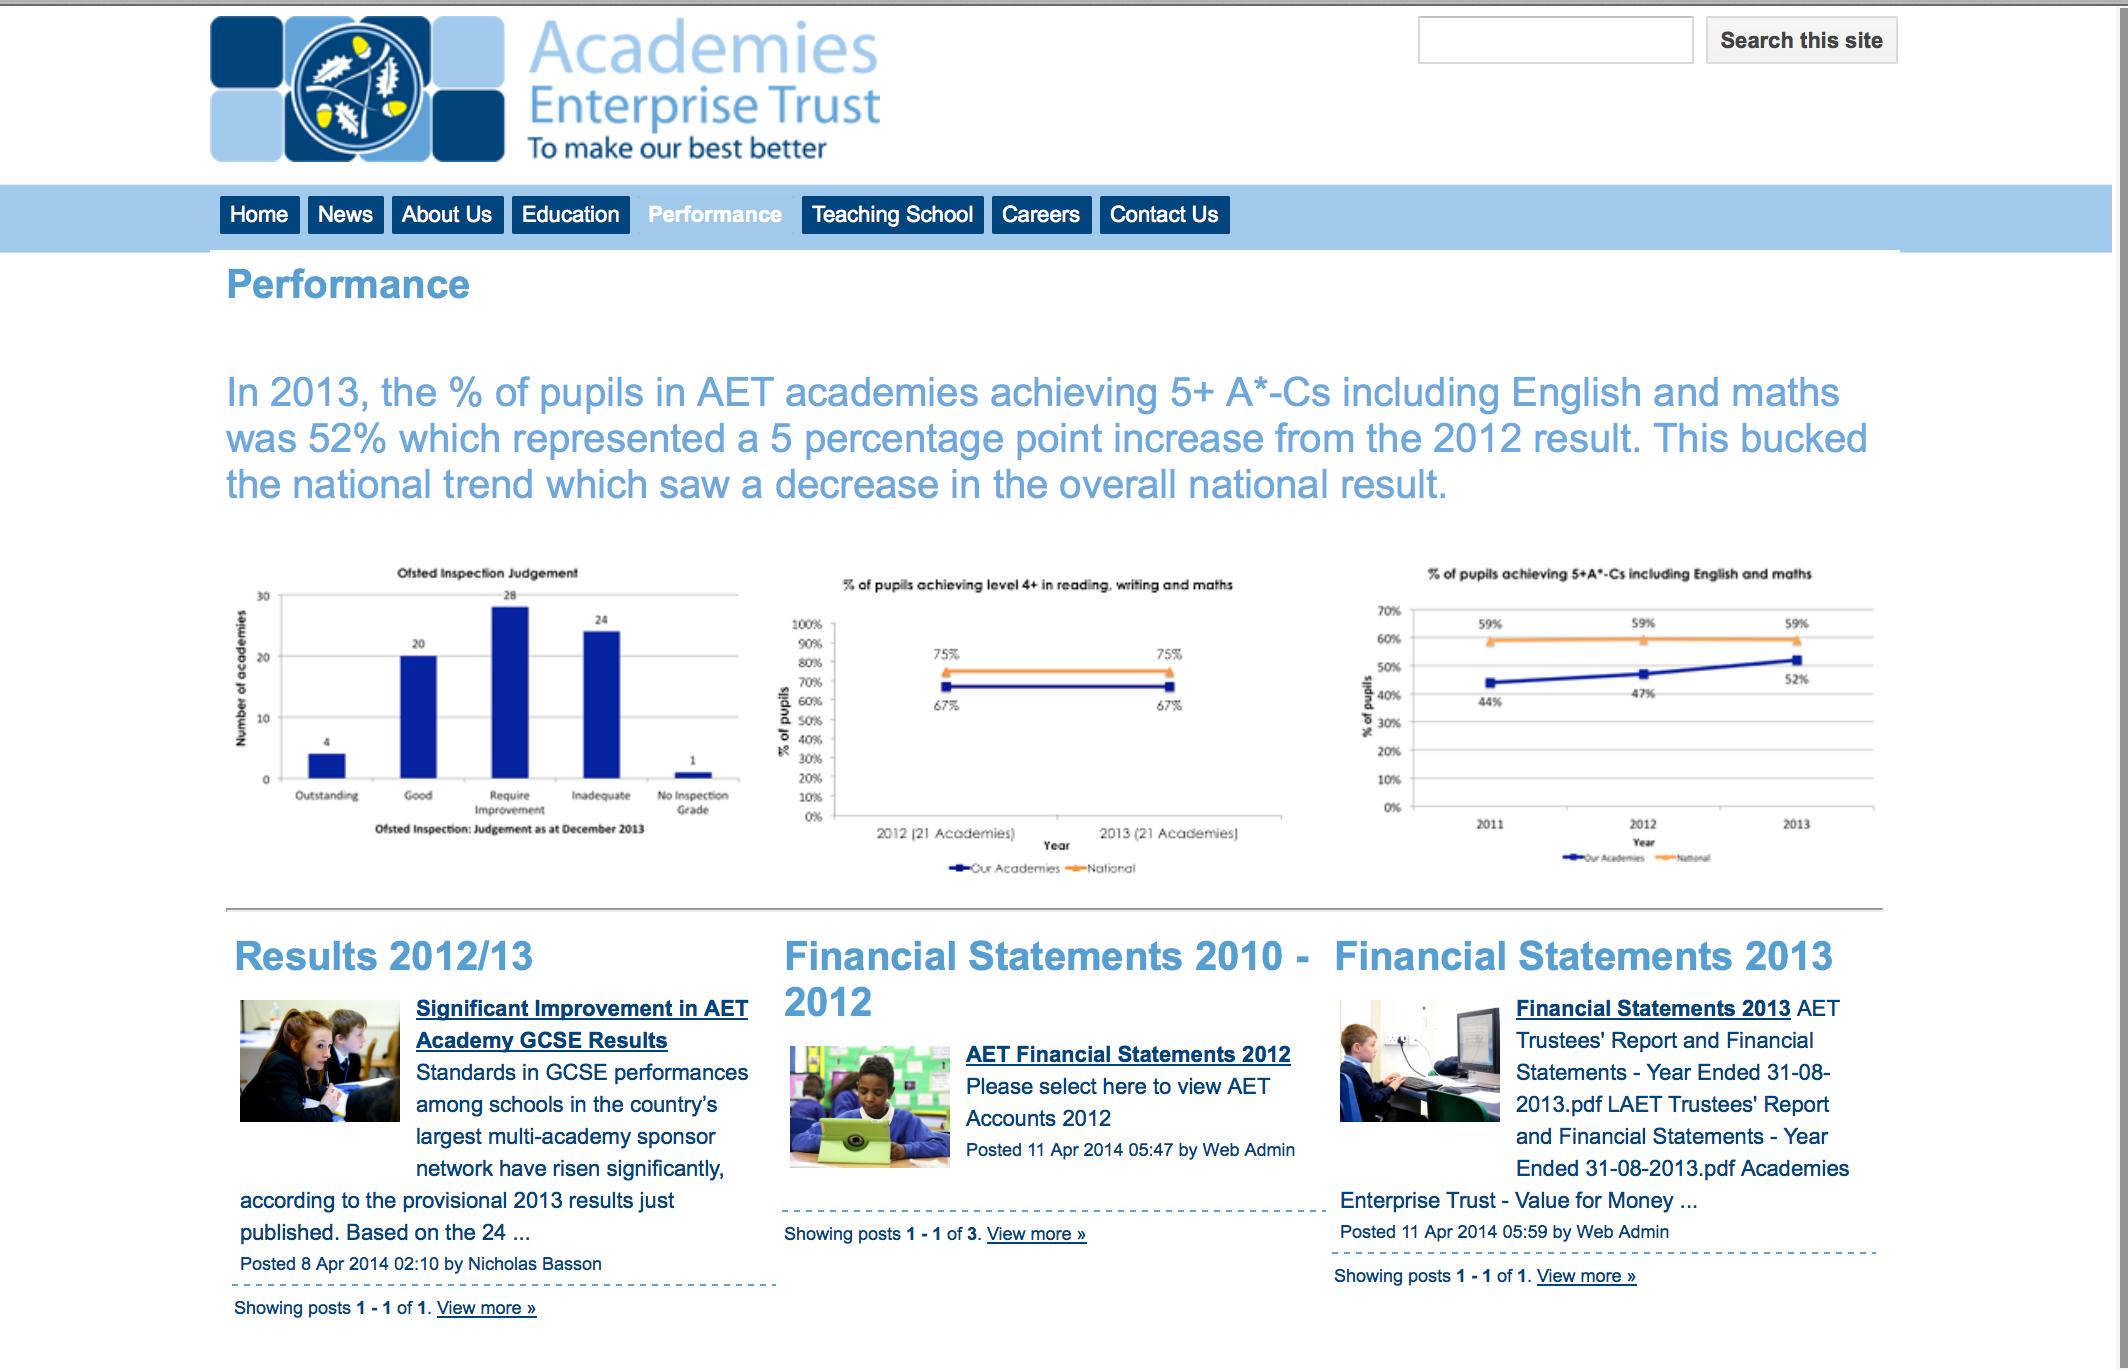 Academies Enterprise Trust